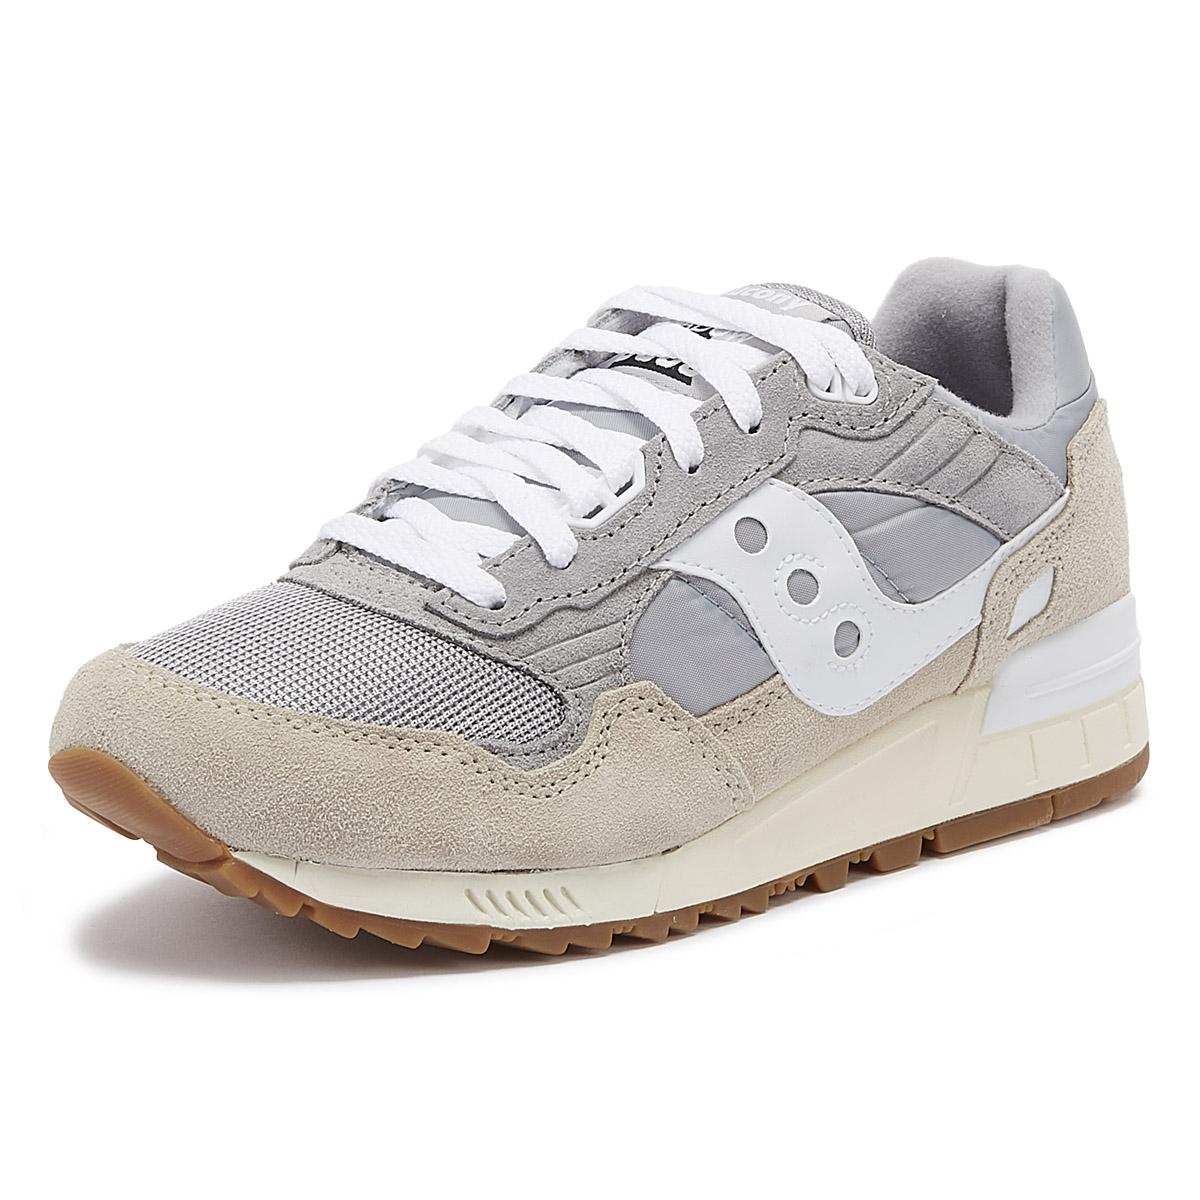 Sneakers SAUCONY Shadow 5000 Vintage S70404 10 GreyWhite